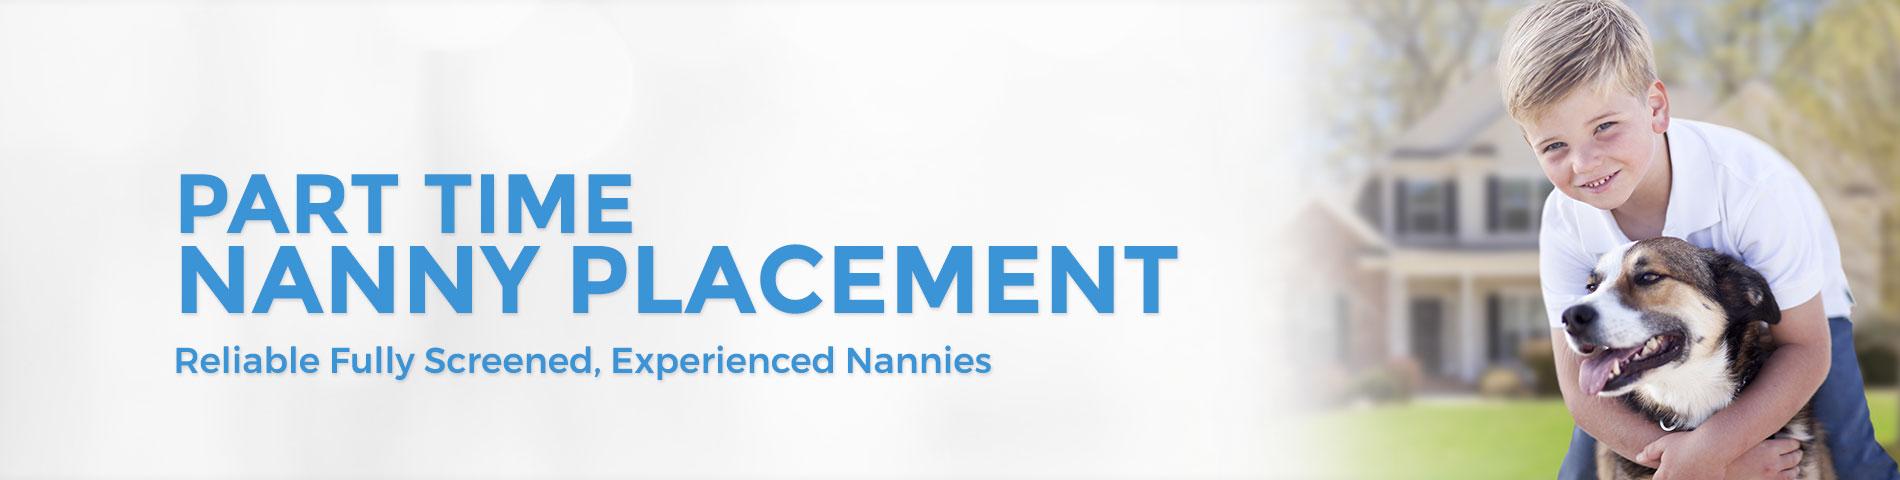 Part Time Nanny Placement